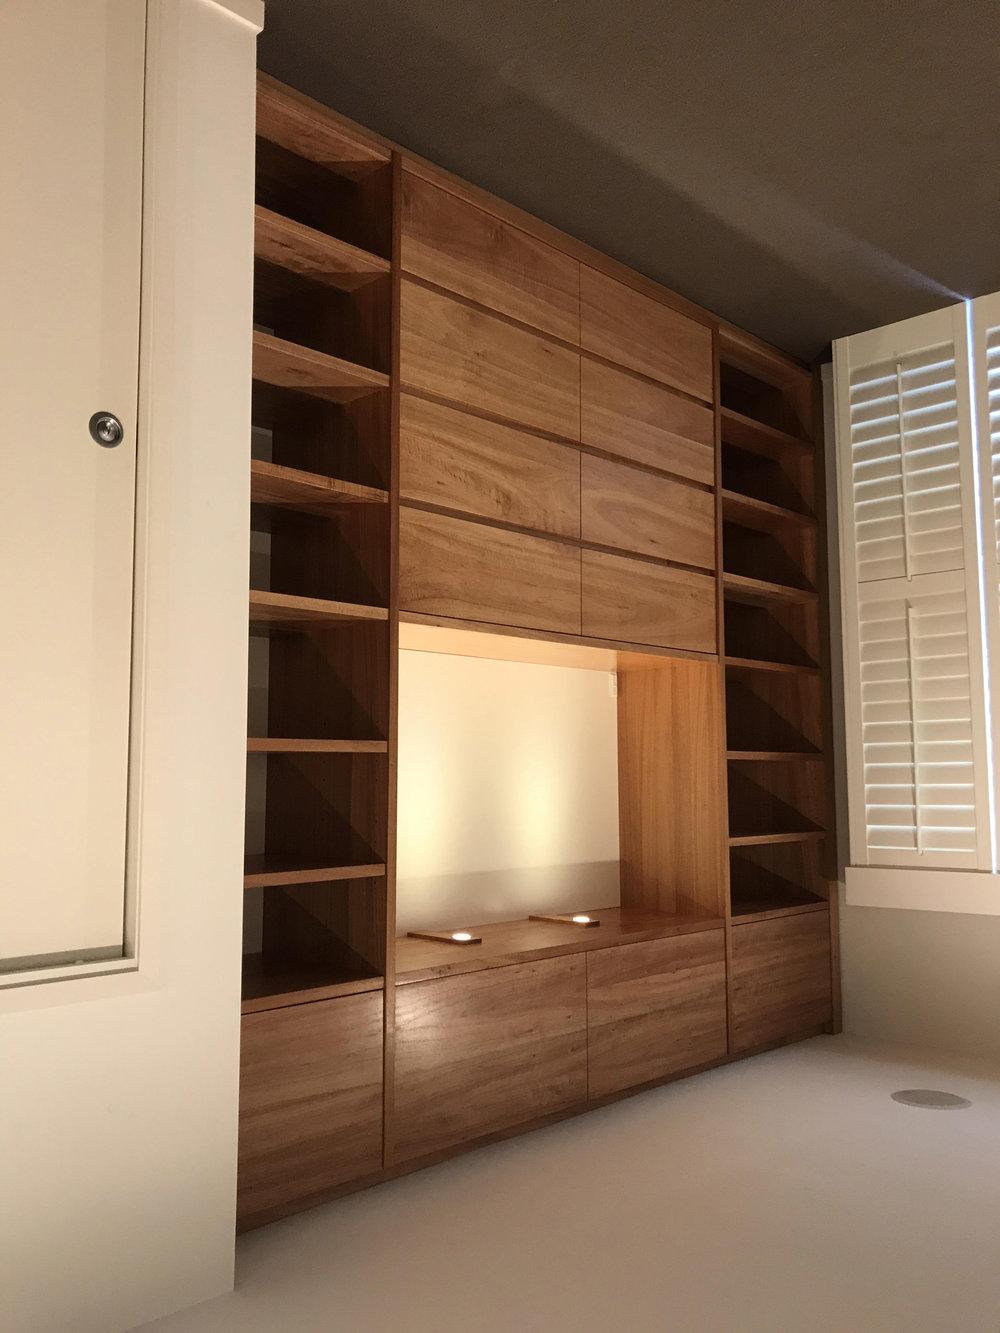 Built-ins & Bookcases